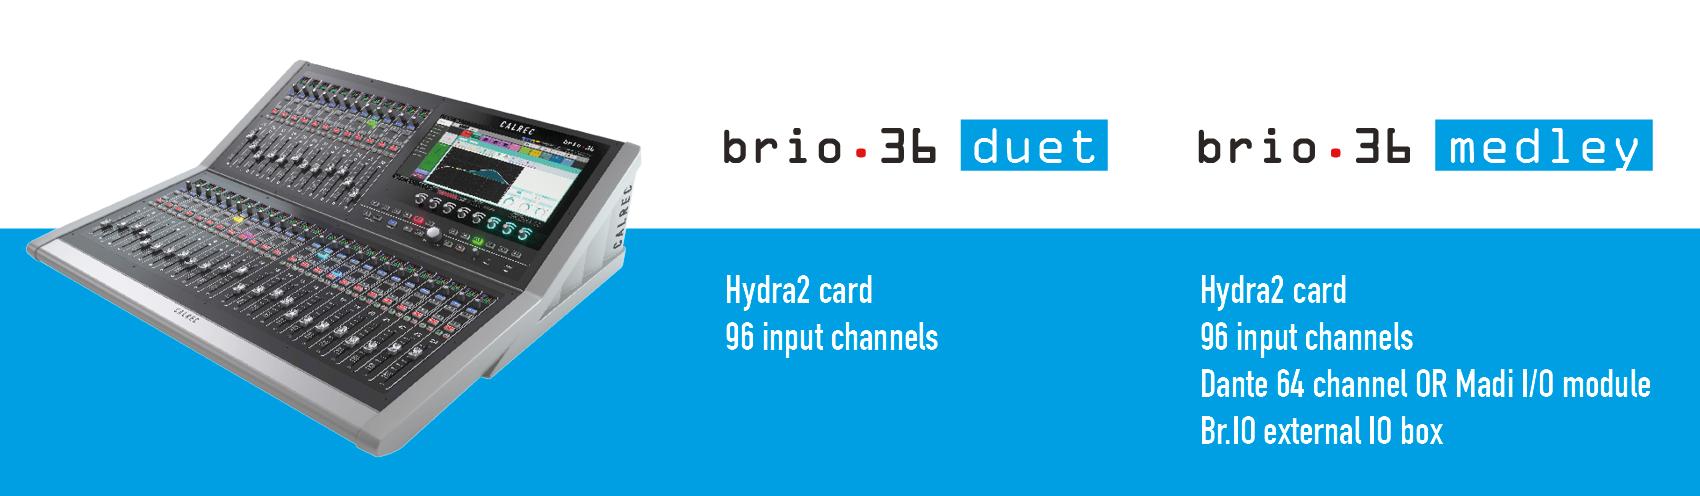 Brio Duet and Medley